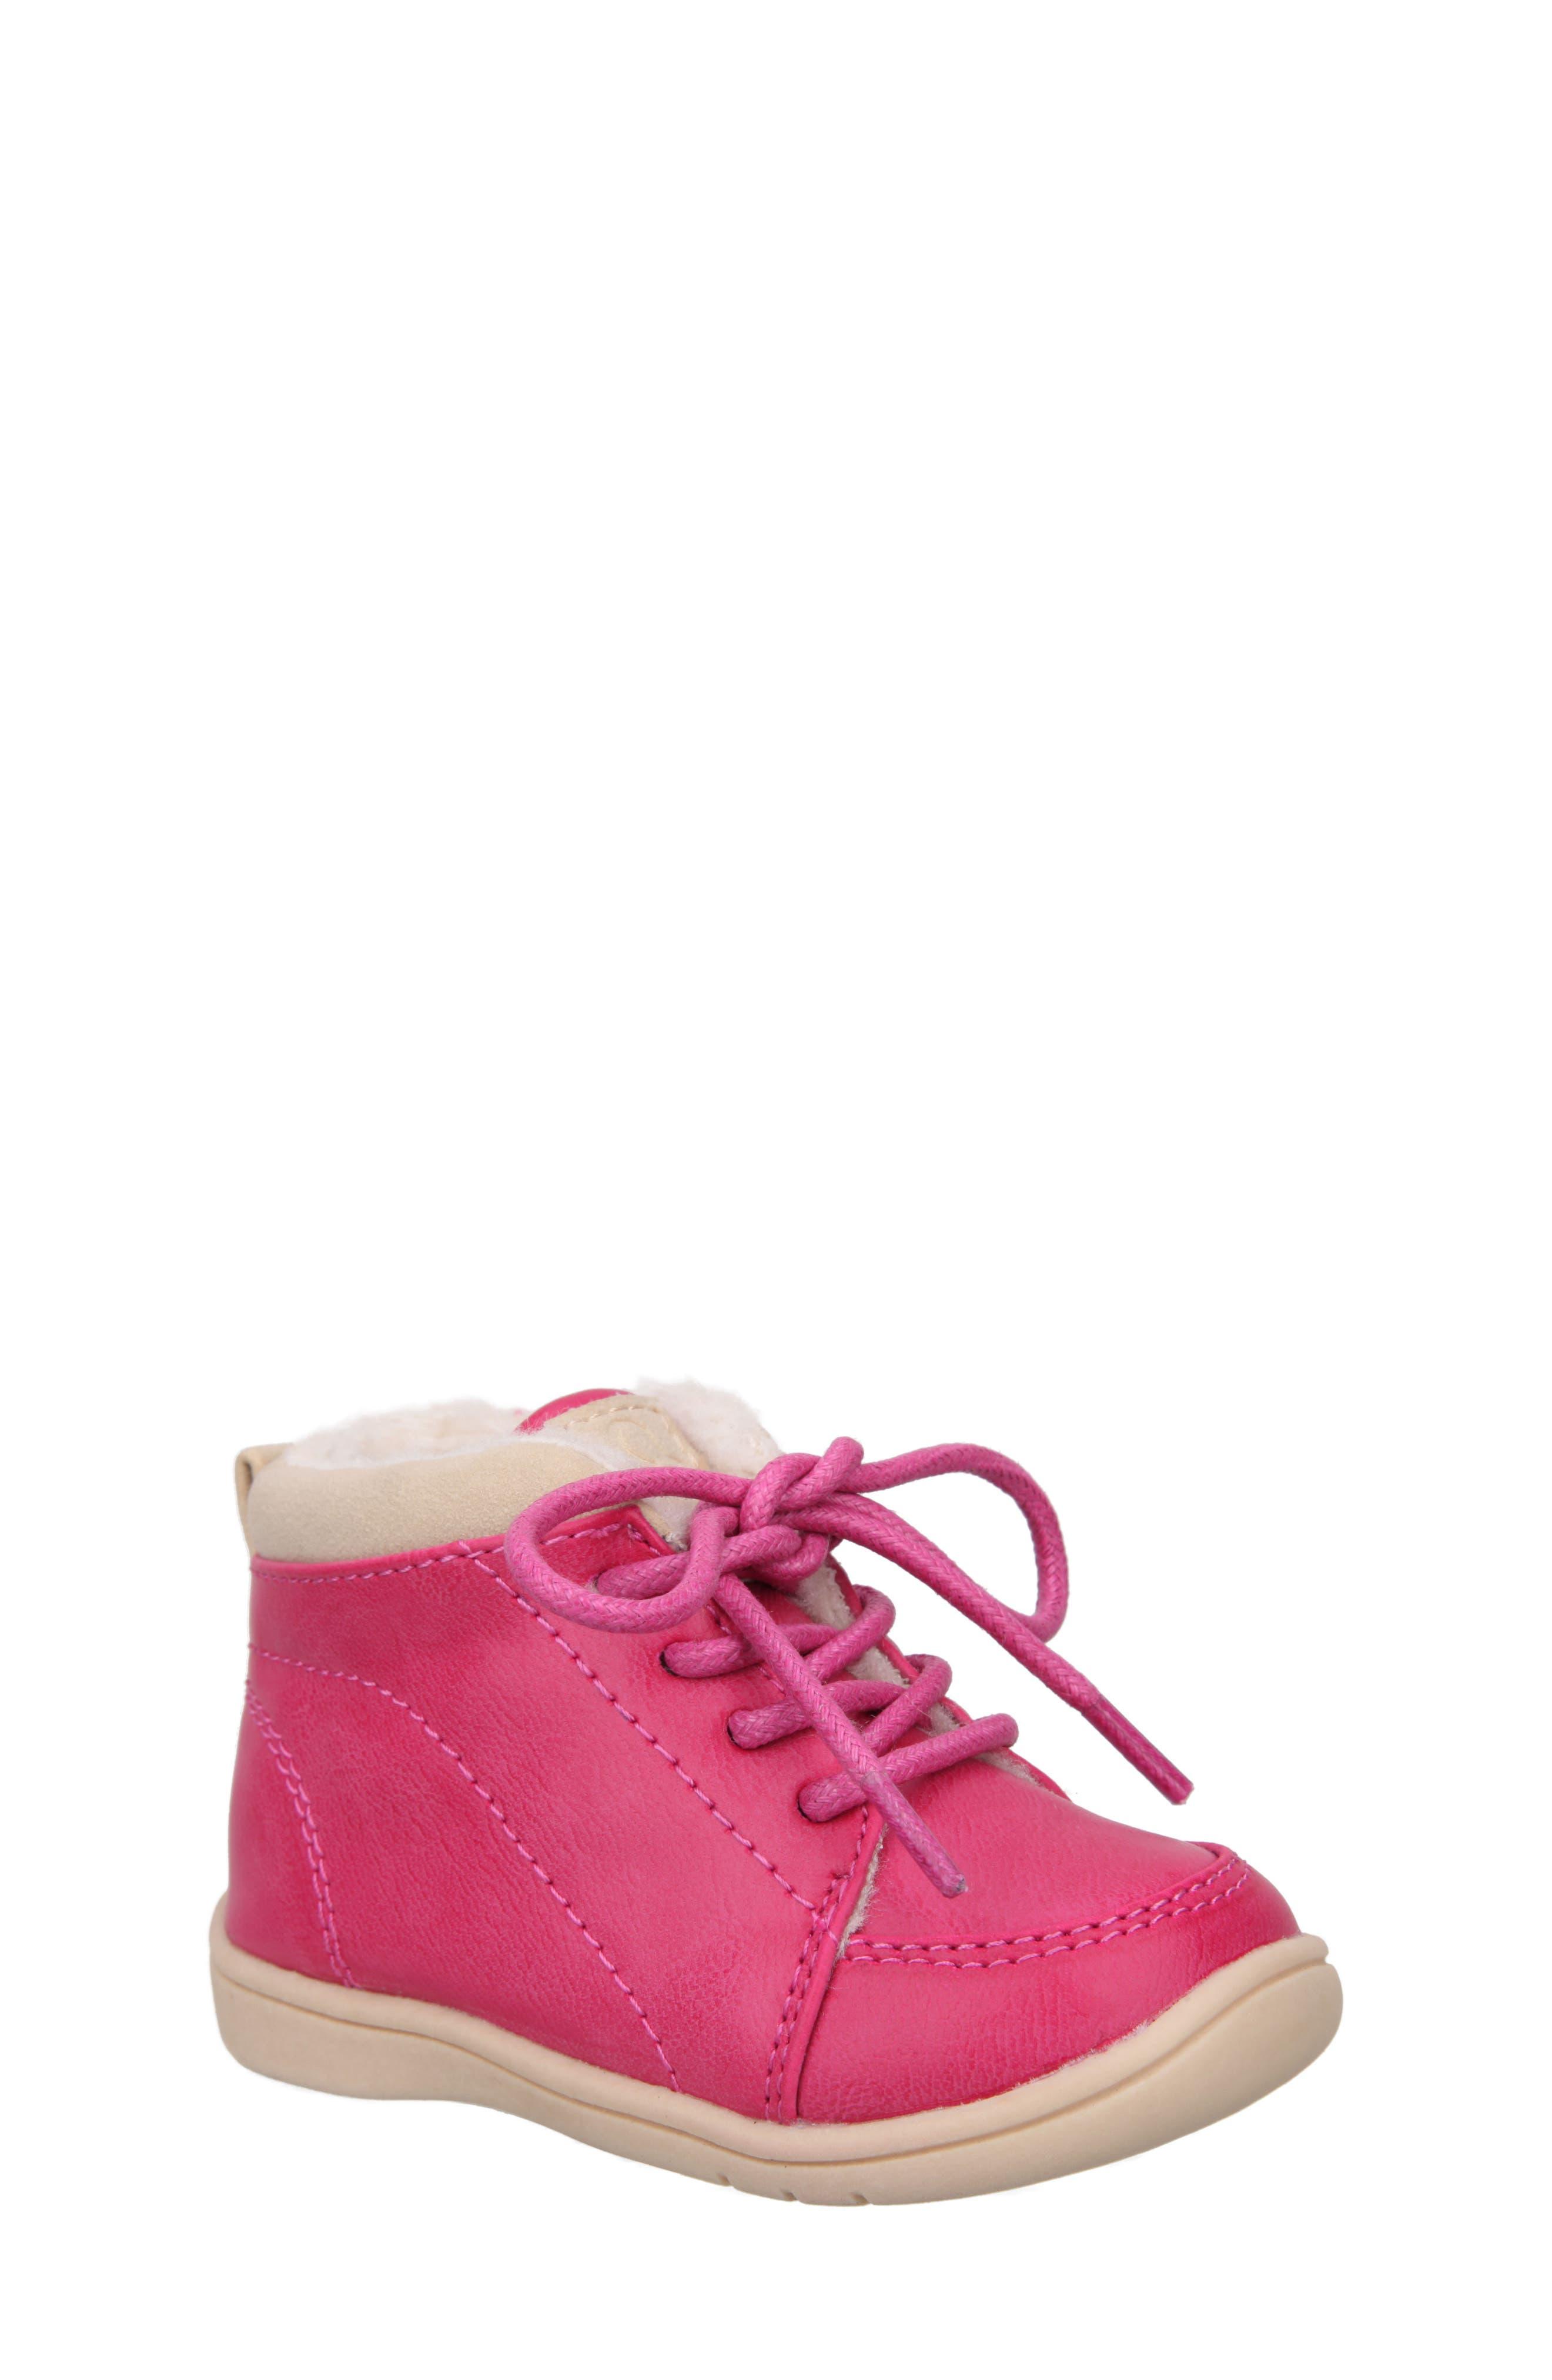 Main Image - Nina Mobility Moe Sneaker (Baby & Walker)